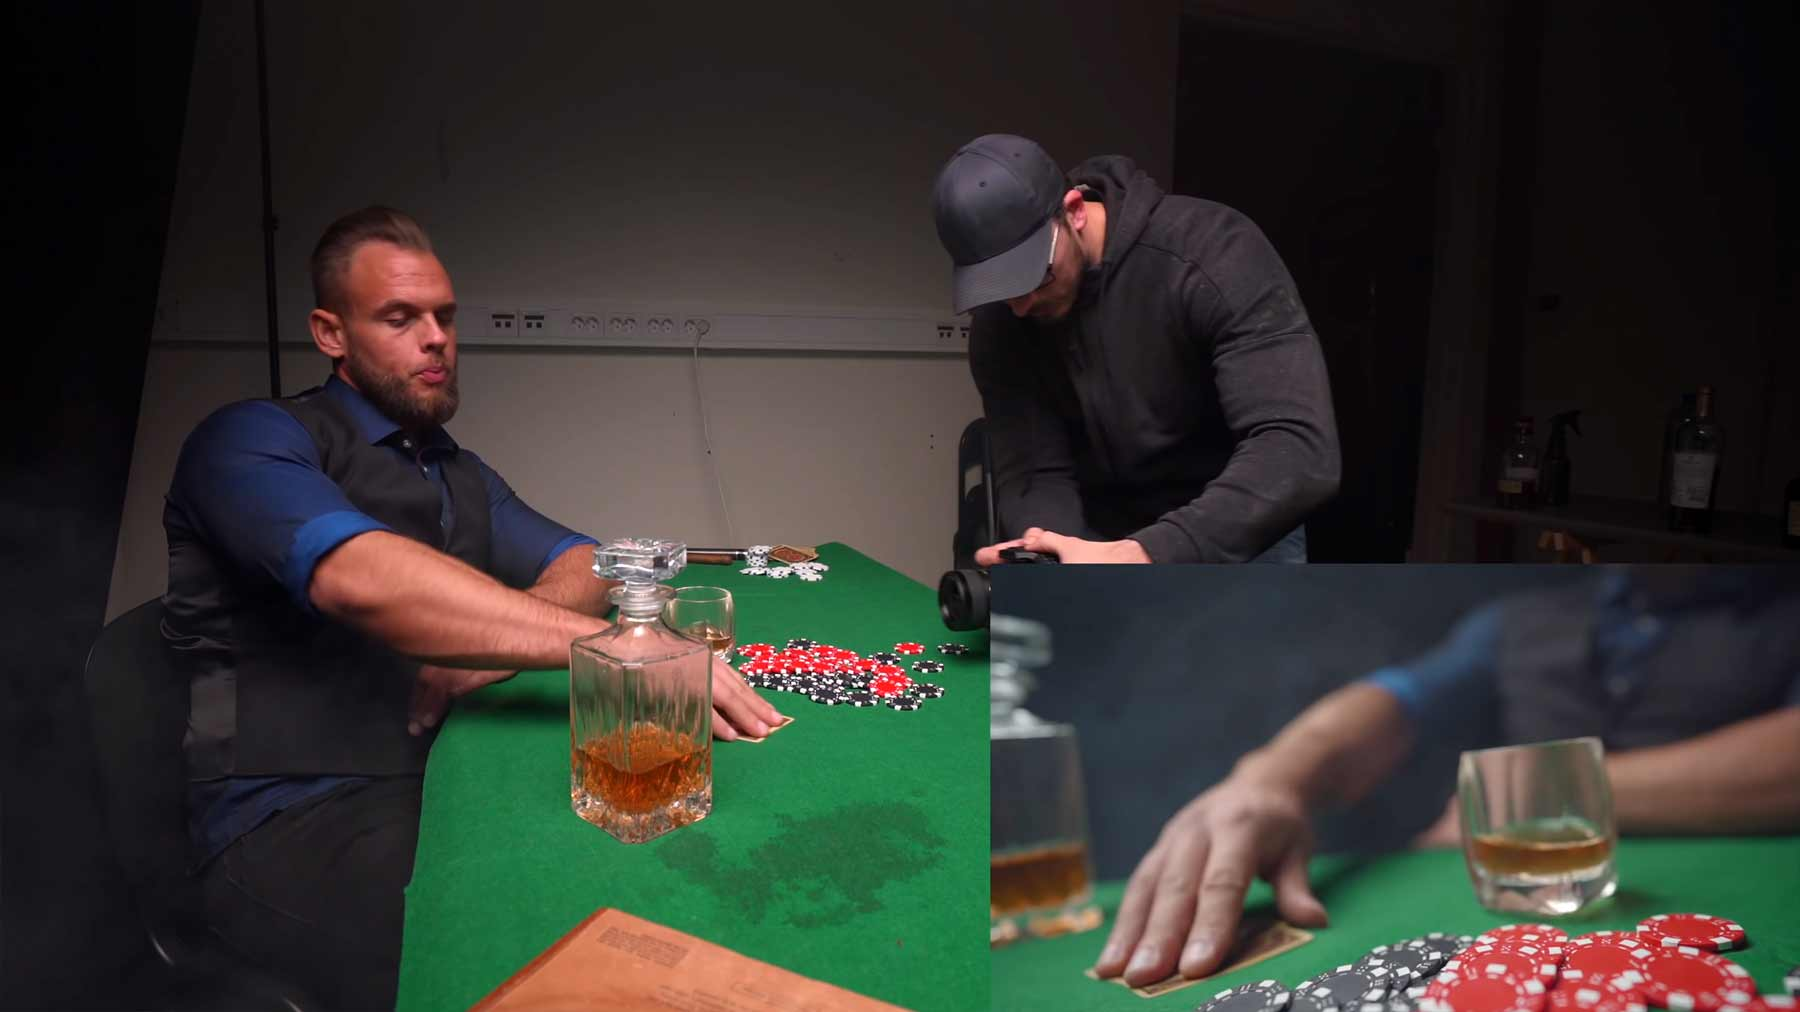 Making of einer ziemlich coolen Poker-Szene making-of-pokerszene